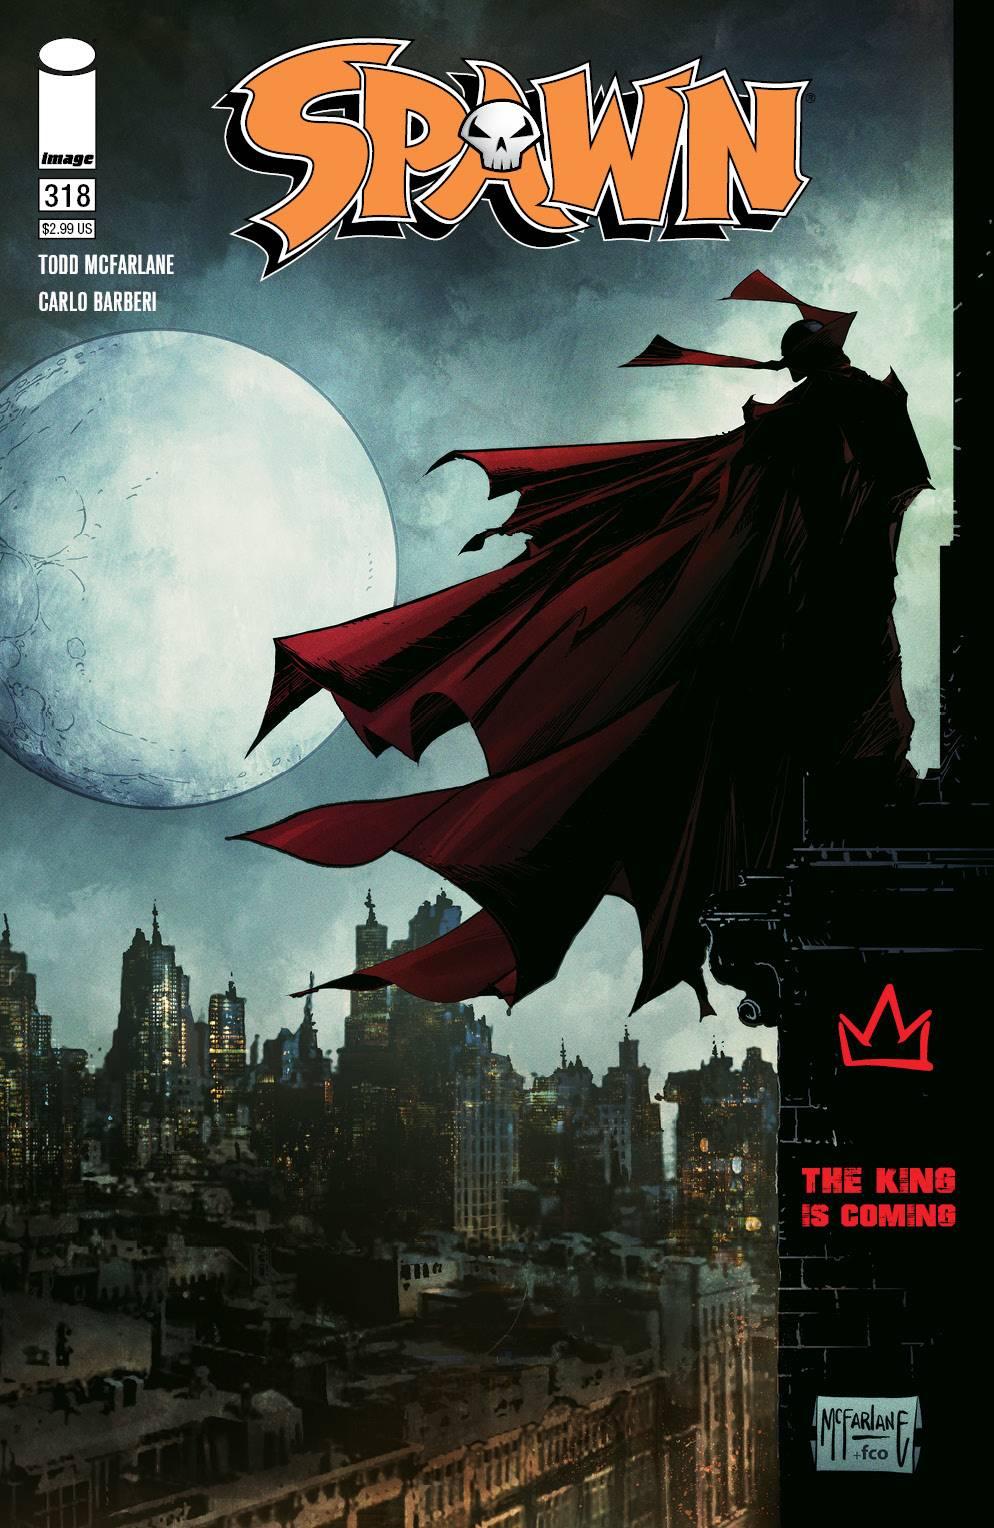 STL185699 ComicList: Image Comics New Releases for 05/26/2021